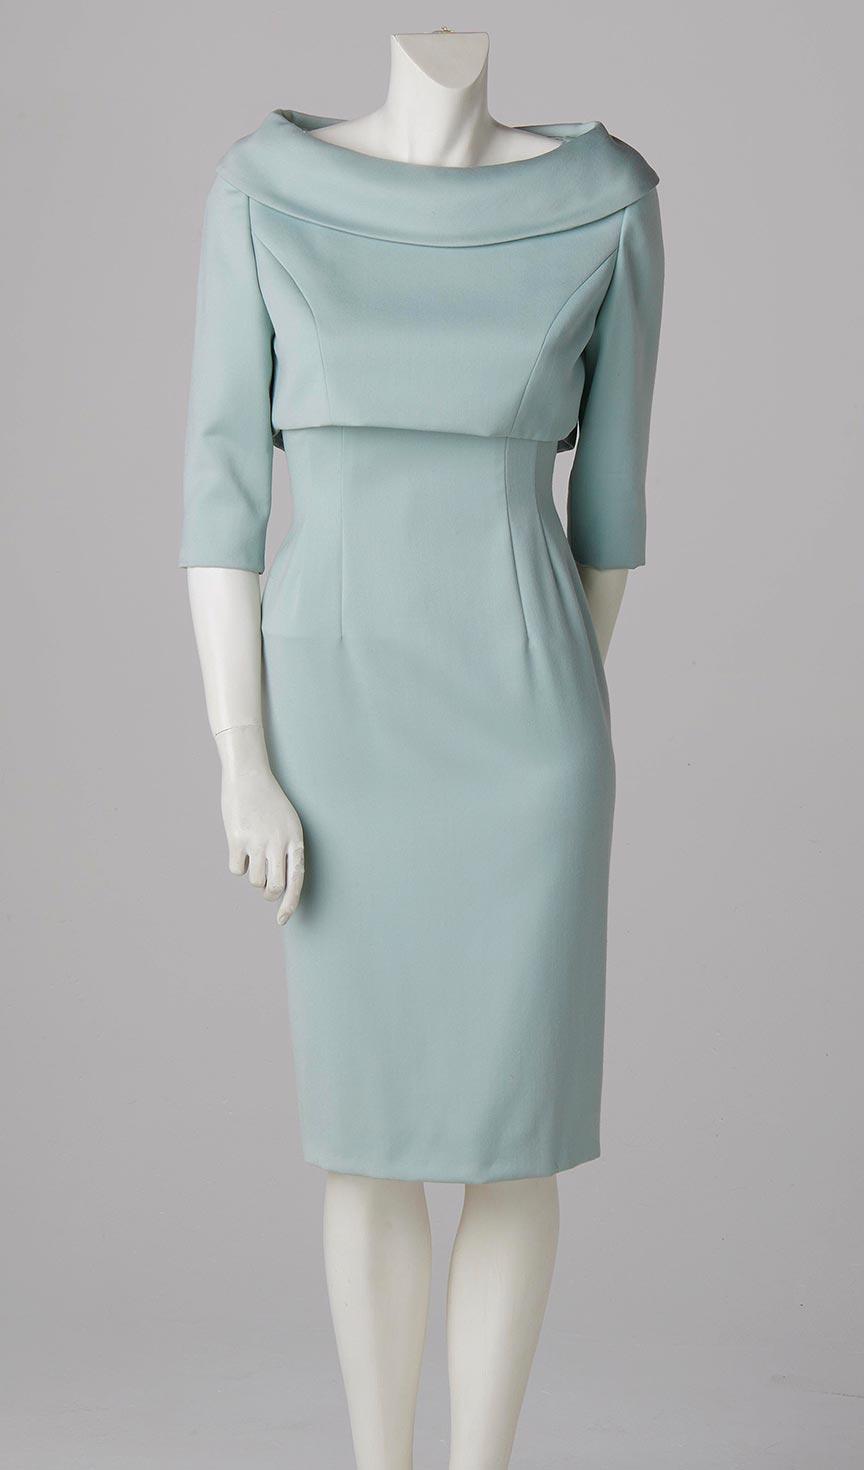 duck egg blue shift dress satin and crop jacket formal wear bespoke couture